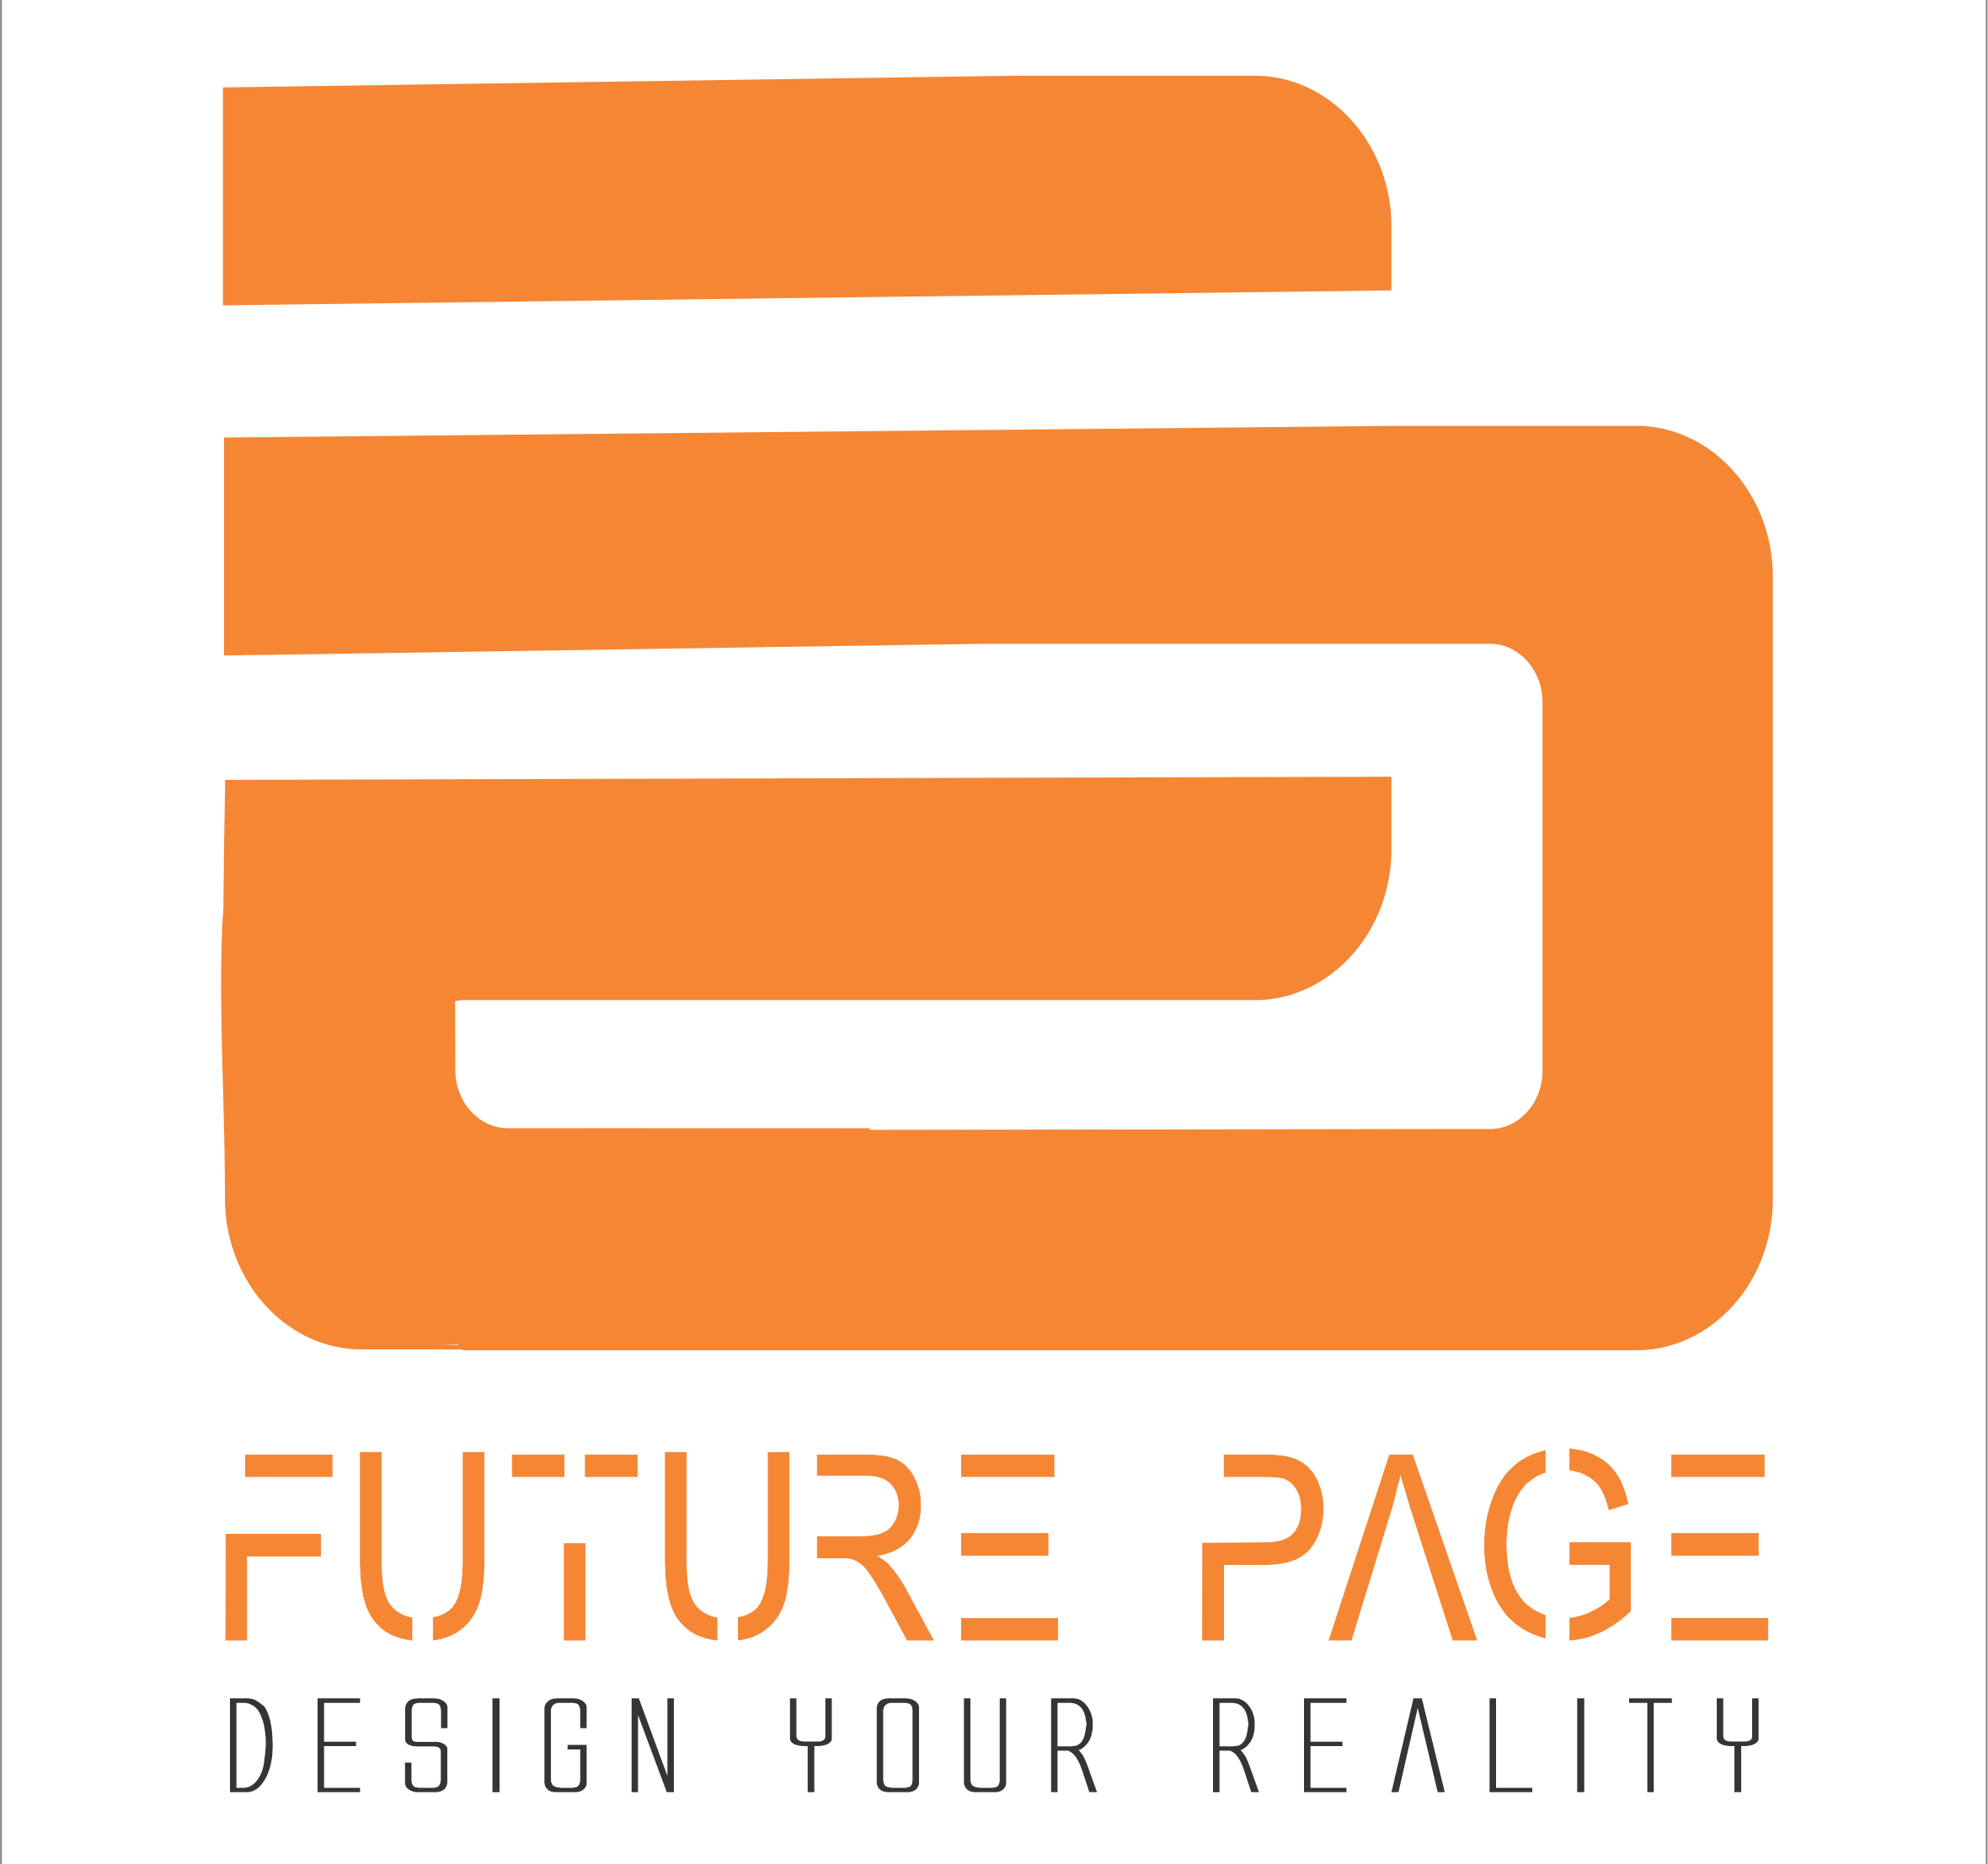 FUTUREPAGE